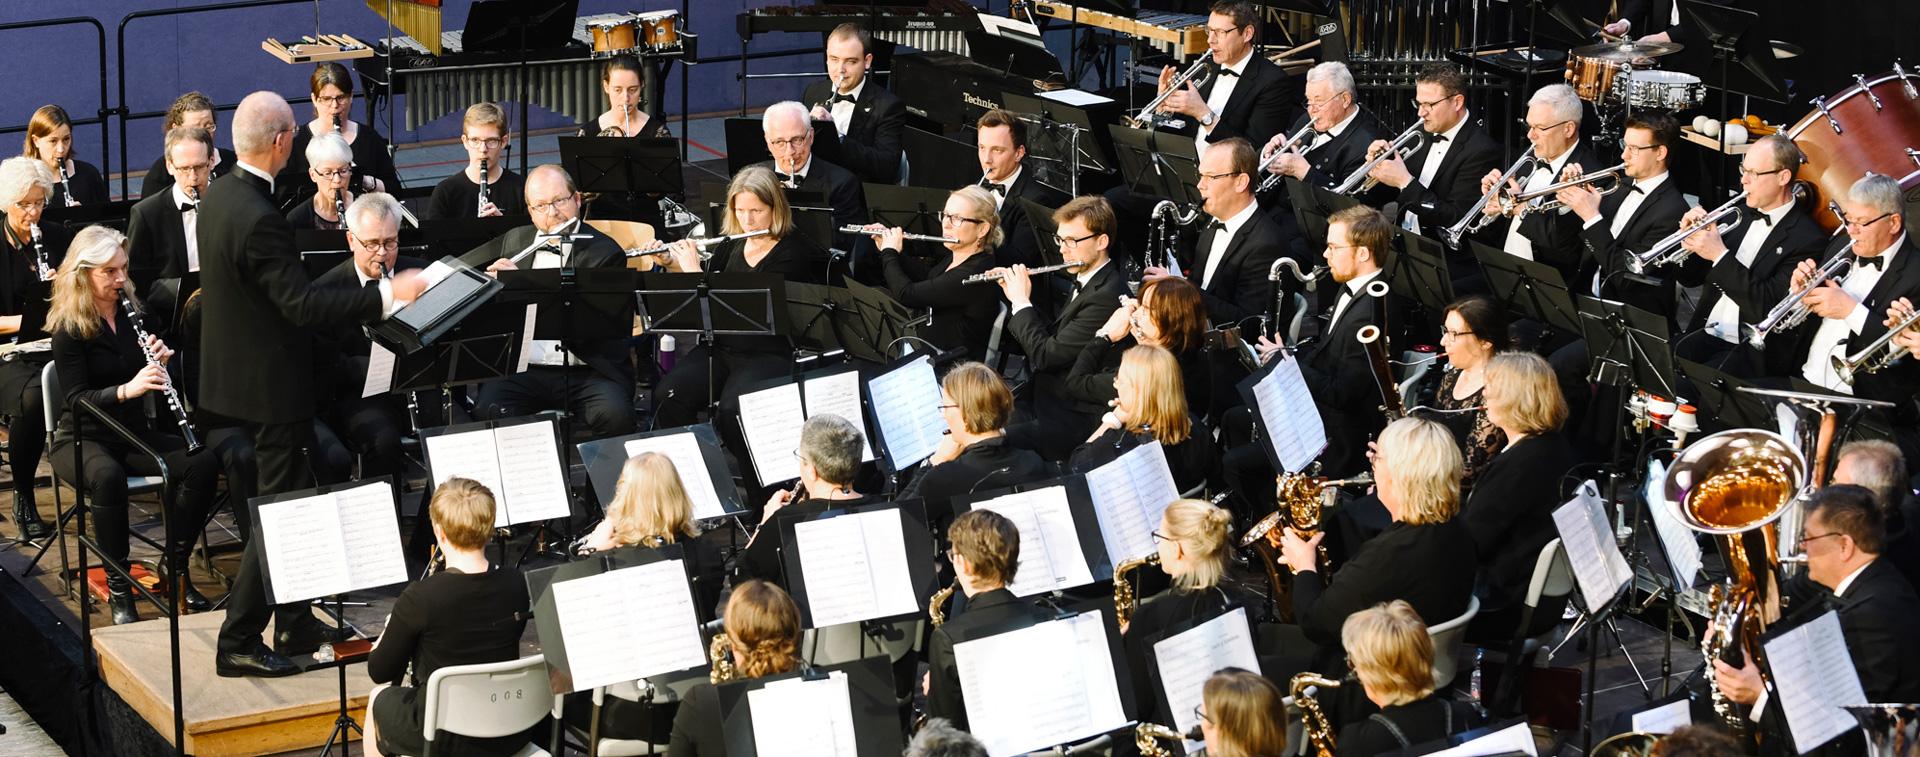 Blasorchester-Havixbeck-Orchester